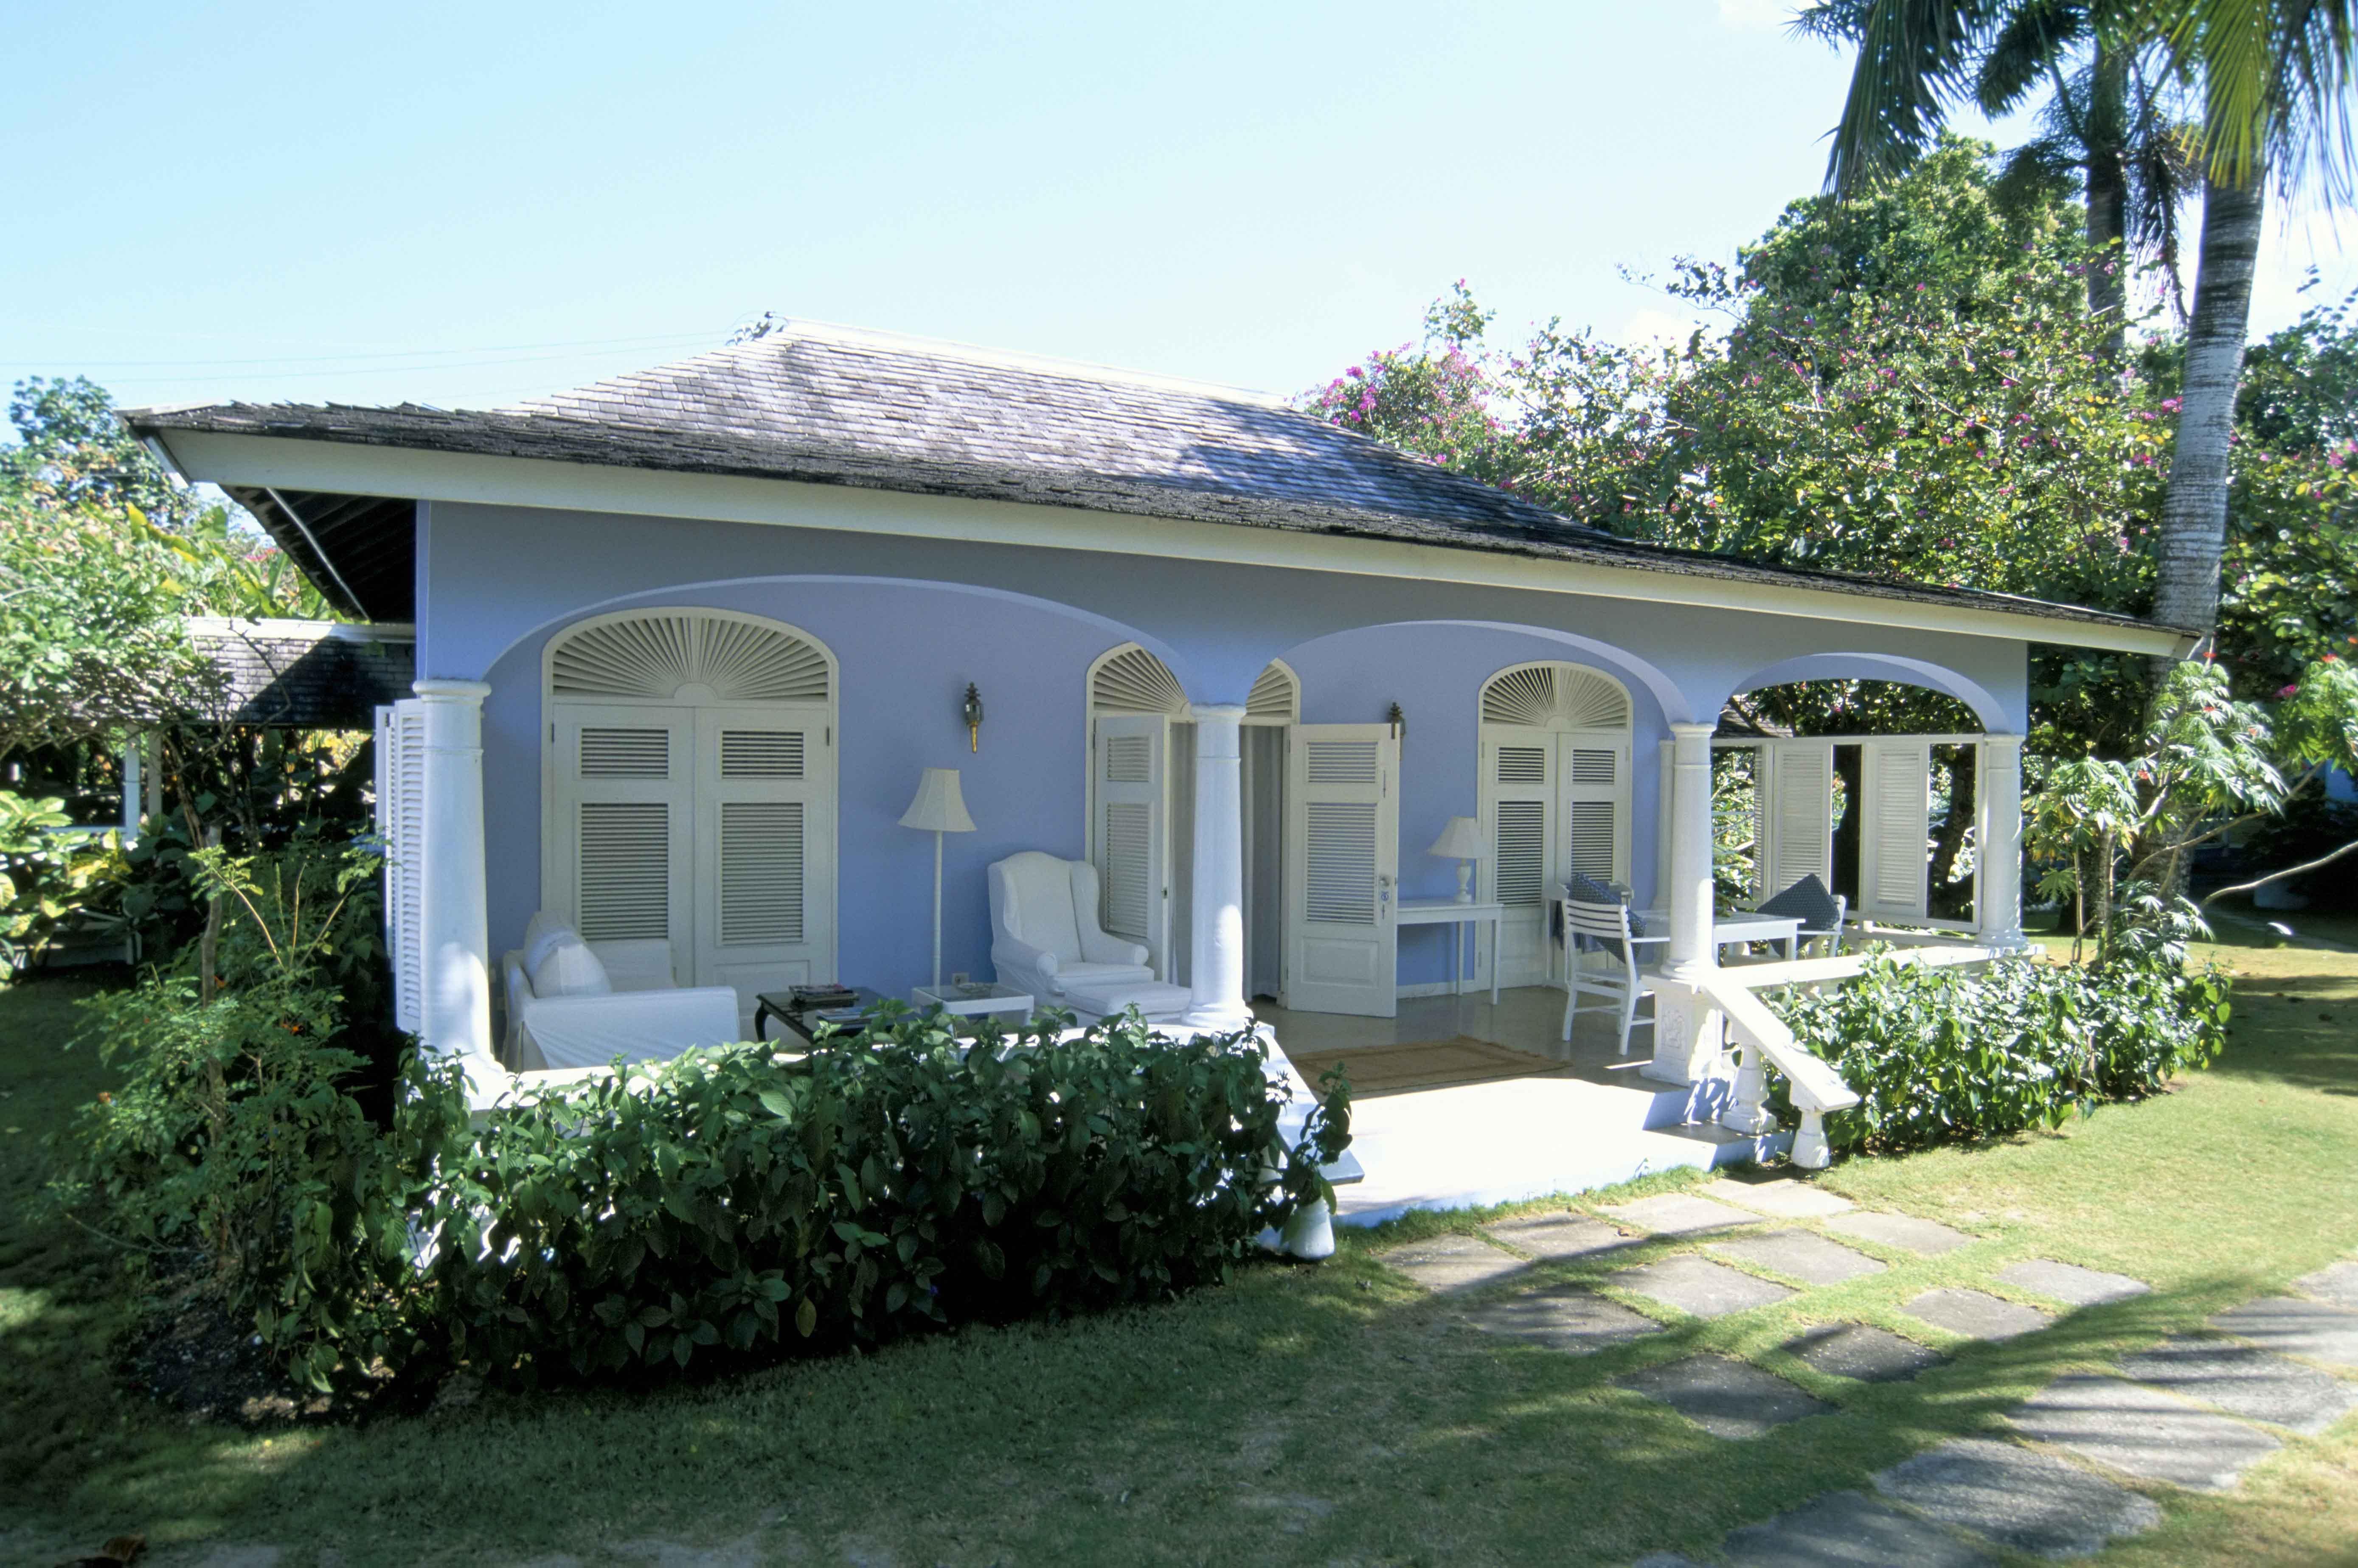 Jamaica Inn Hotel, Ocho Rios, Jamaica, West Indies, Central America